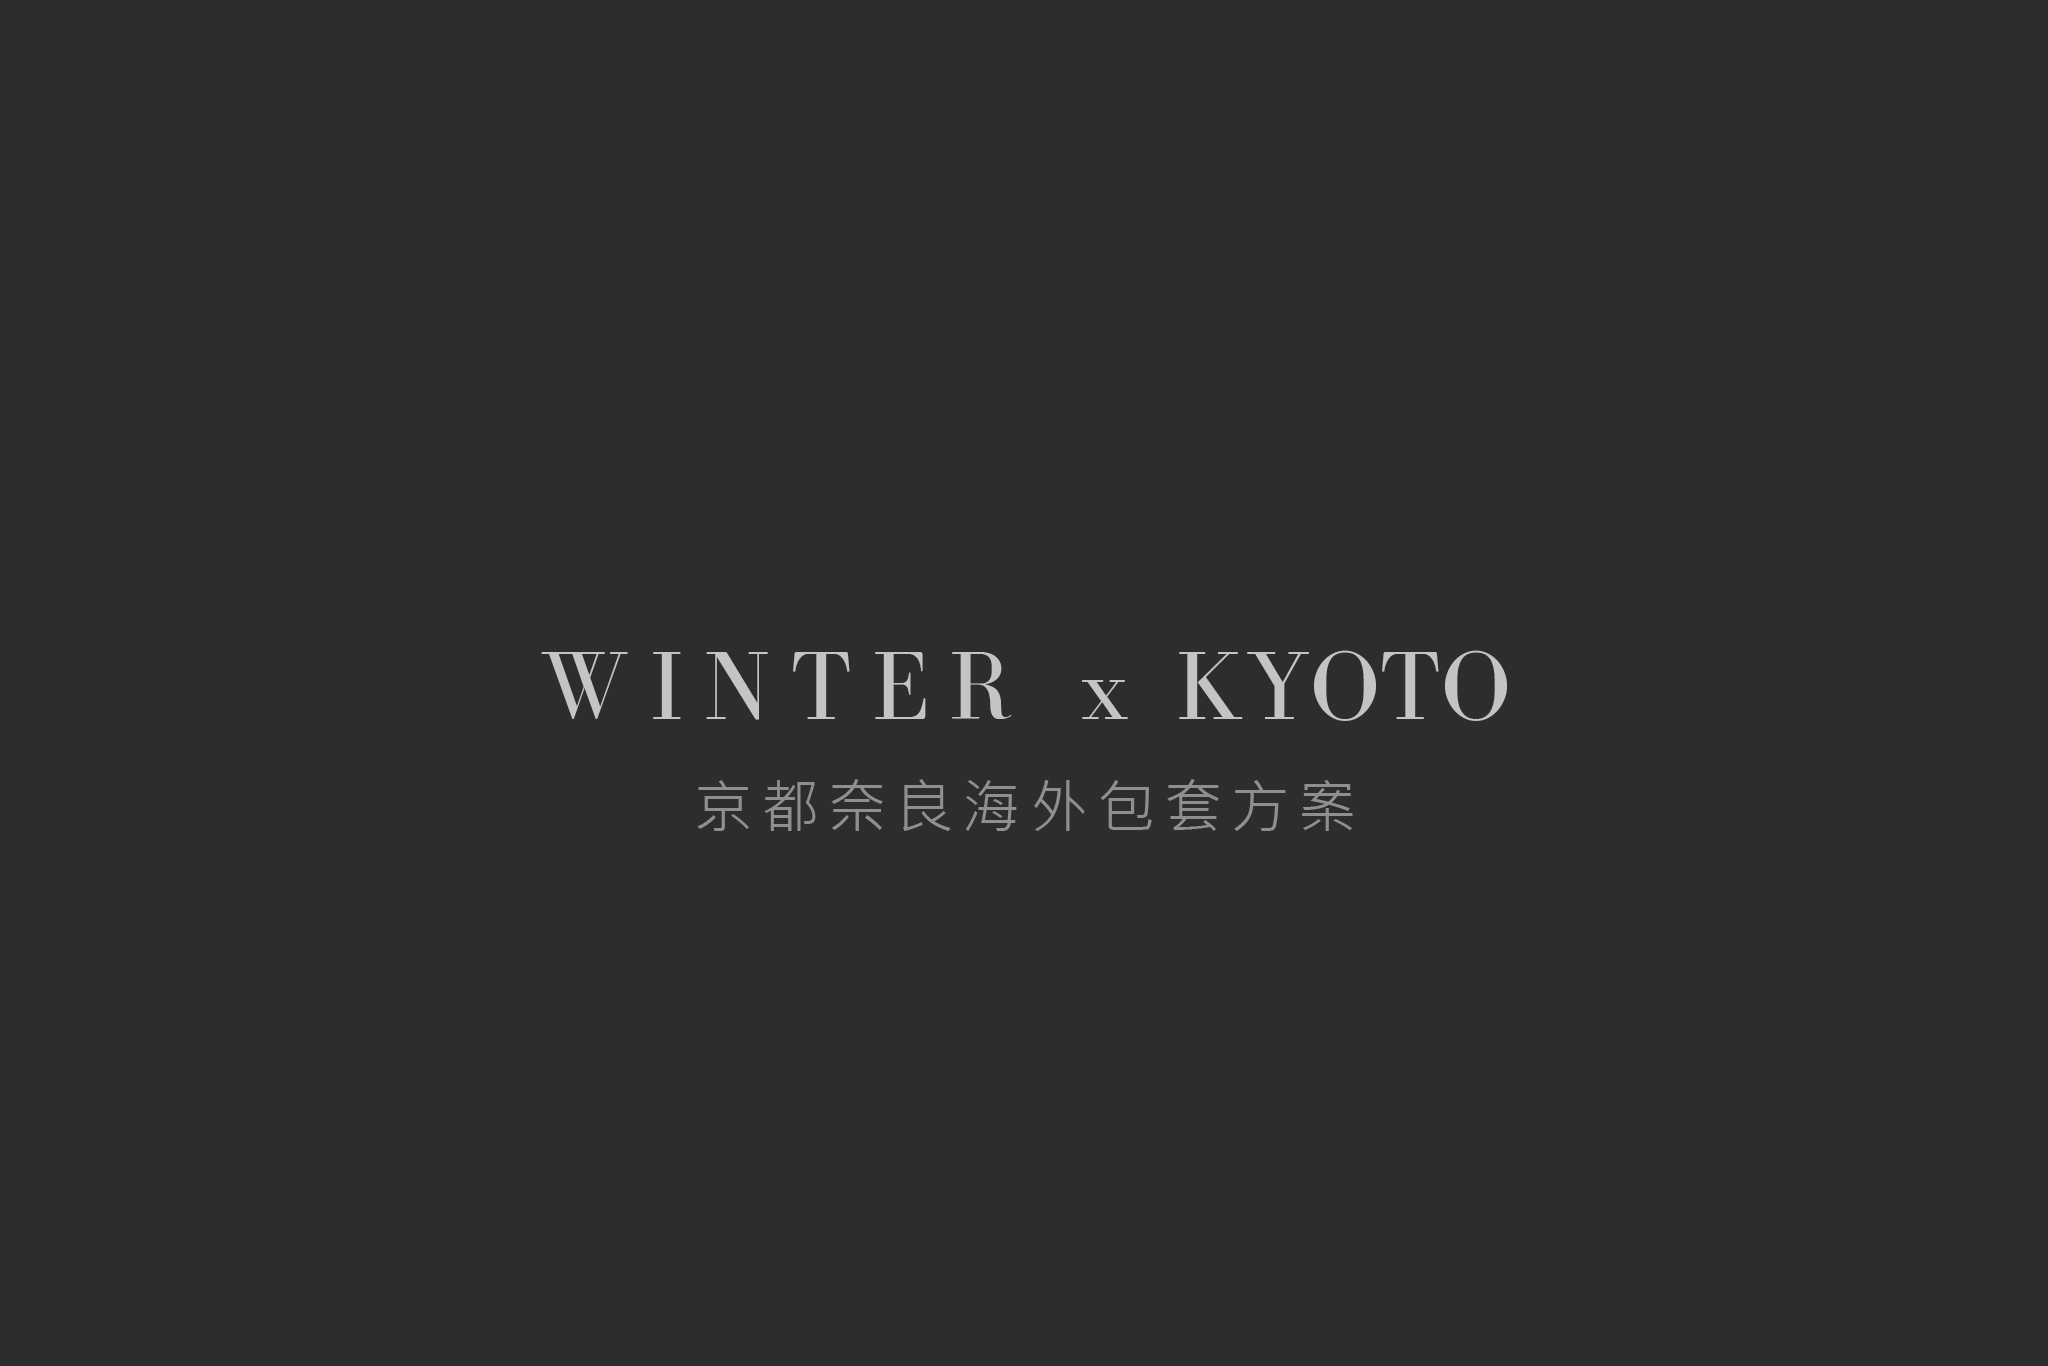 WINTER x KYOTO